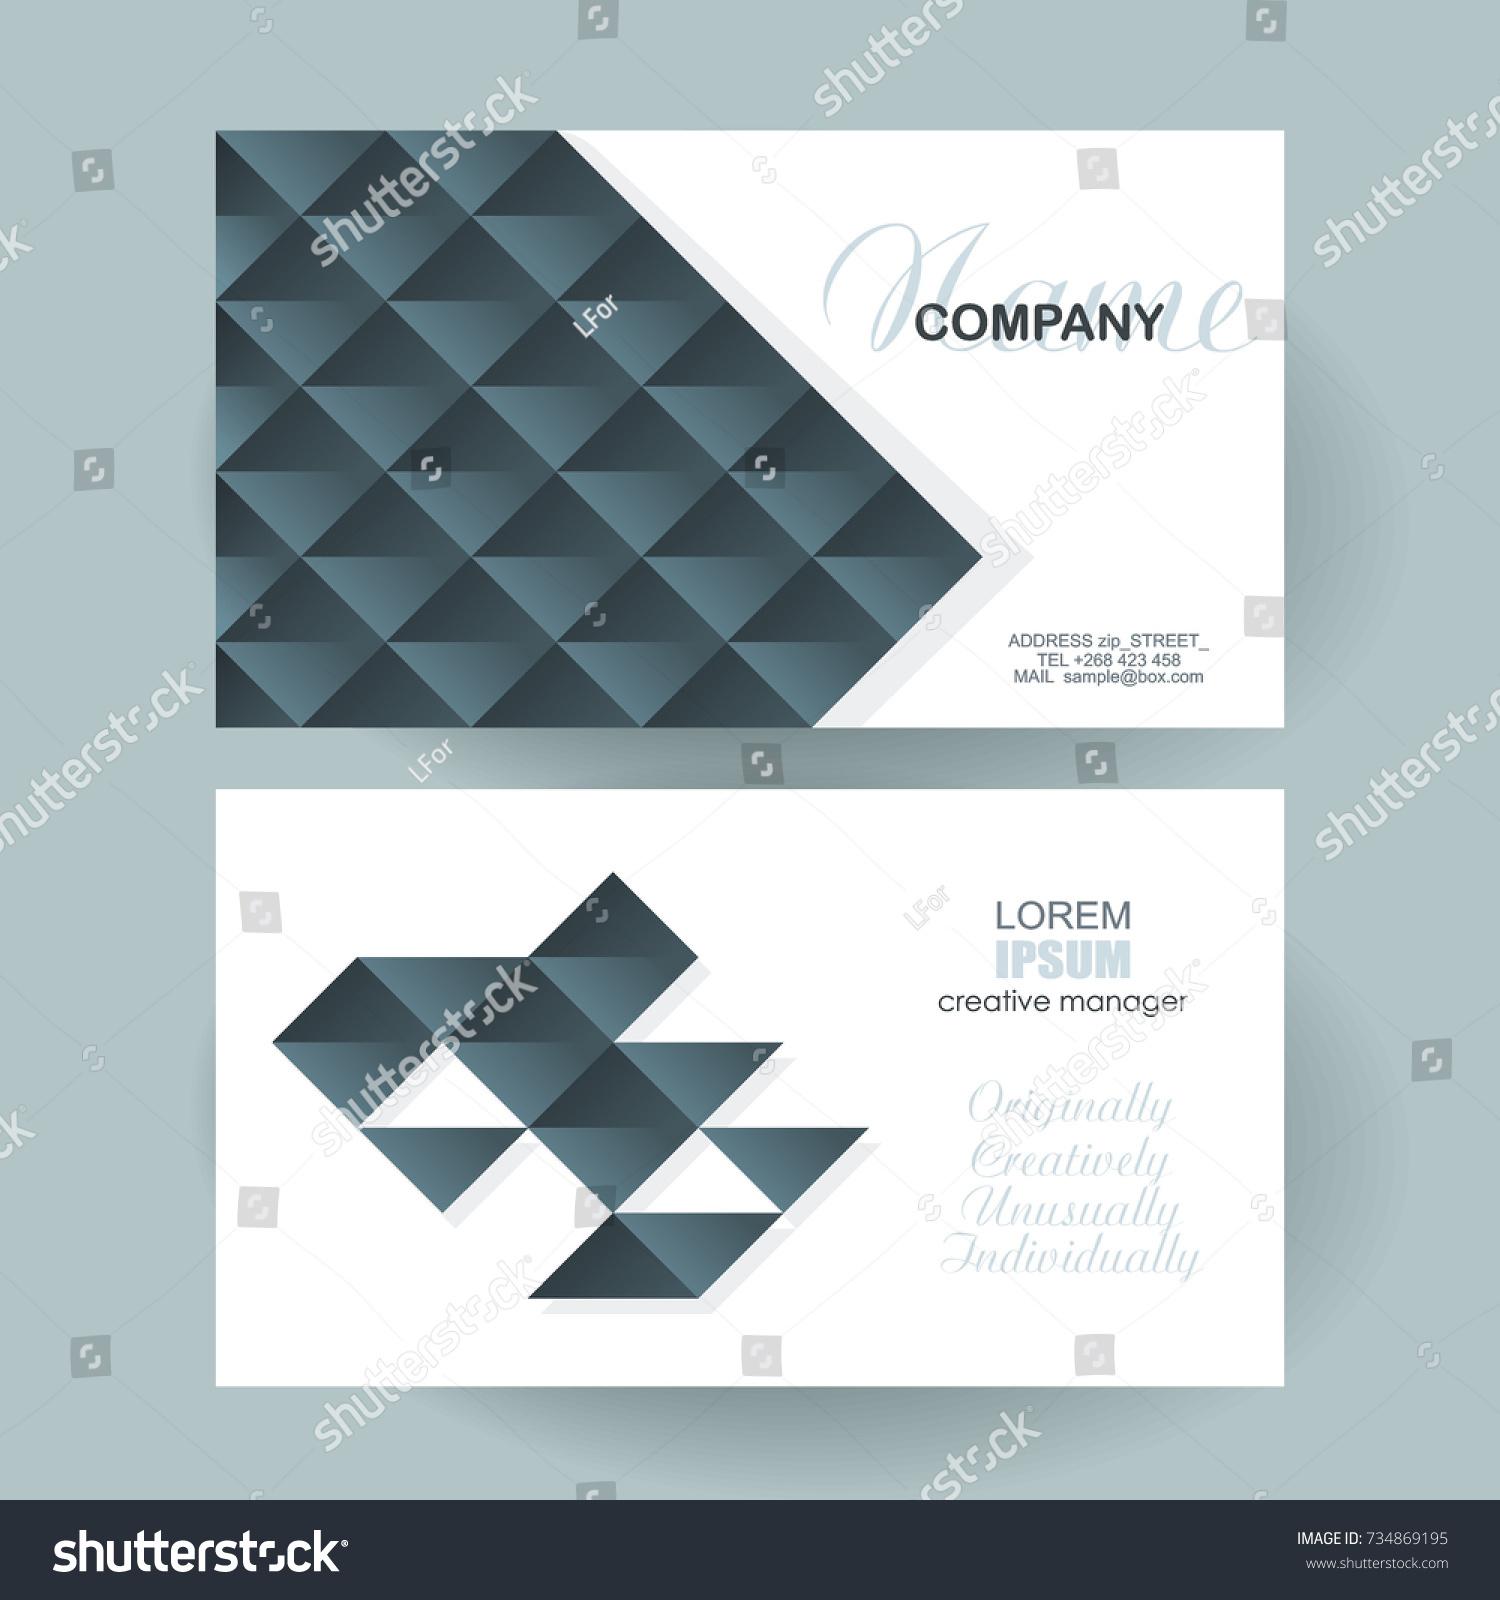 Business Card Design Poligonal Mosaic Pattern Stock Vector ...